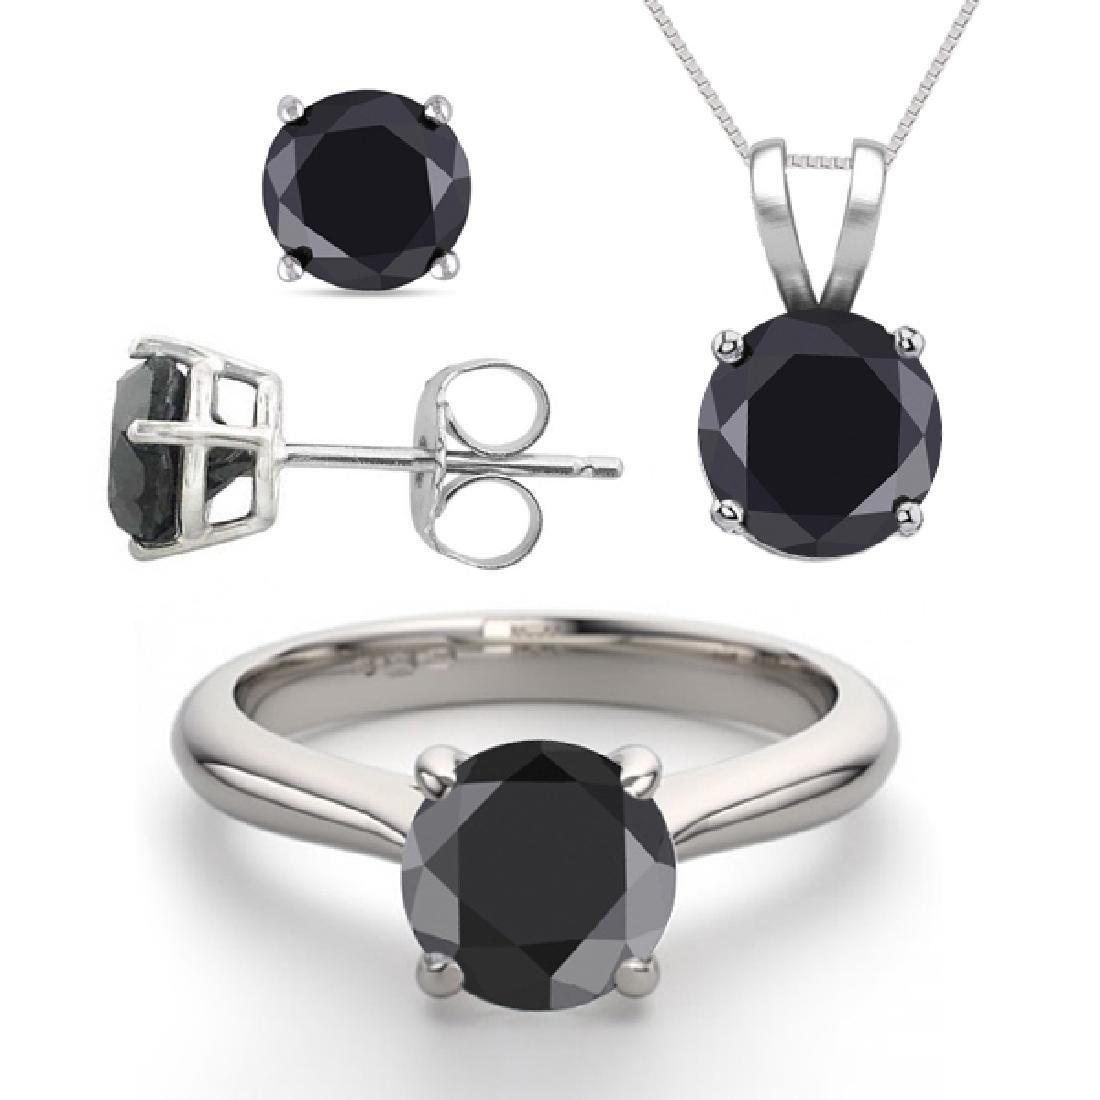 14K White Gold Jewelry SET 3.20CTW Black Diamond Ring,